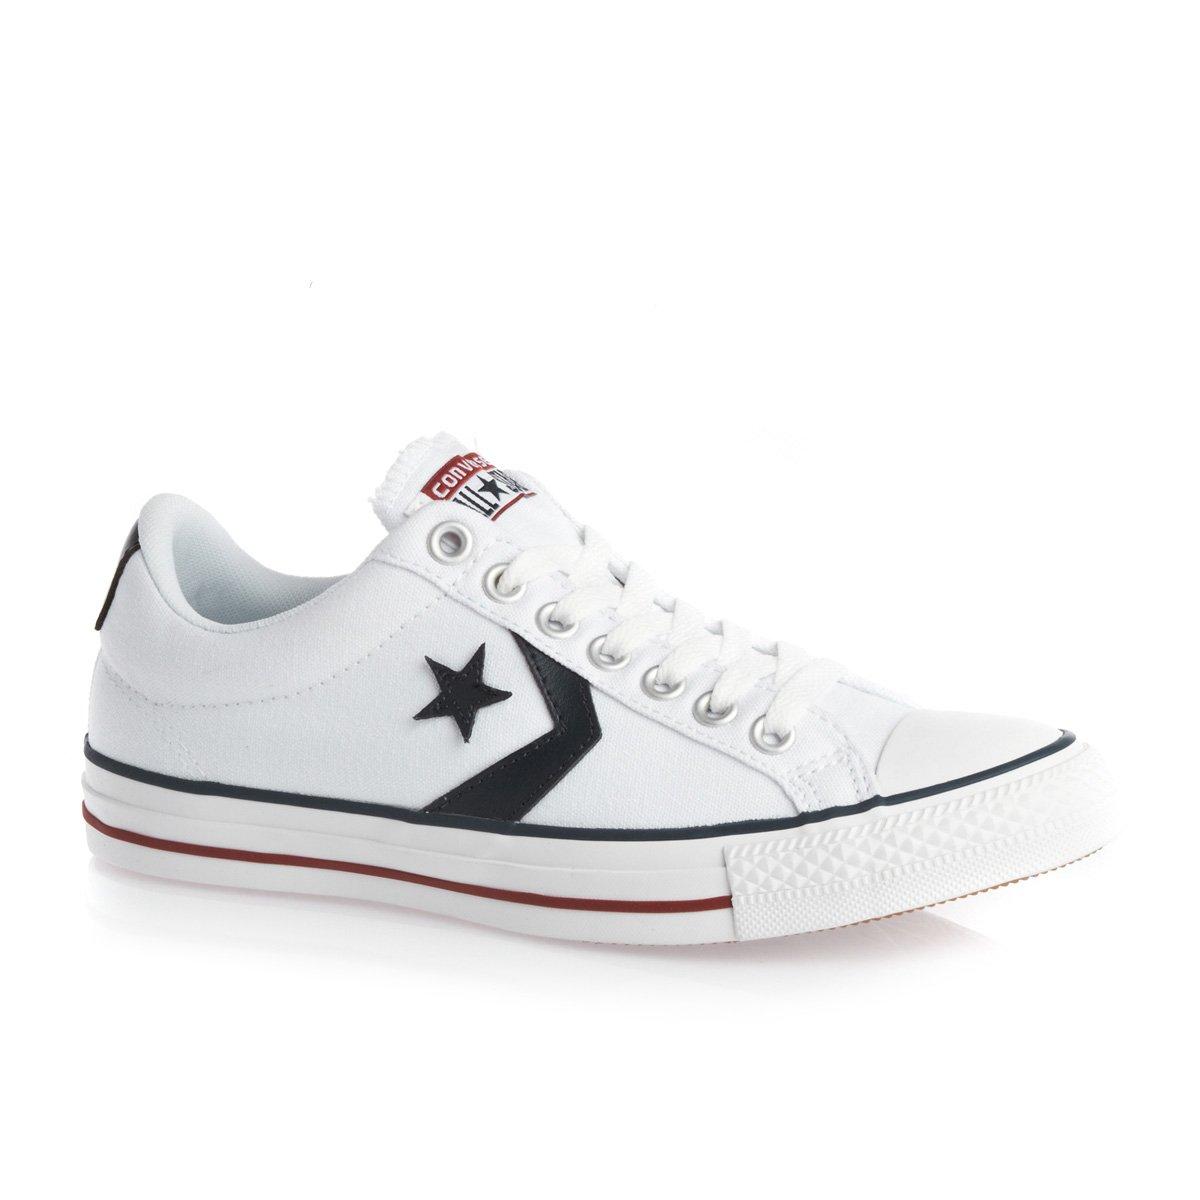 Converse Sp Core Canv Ox 289161-52-10 Unisex - Erwachsene Sneaker  415 EU|*